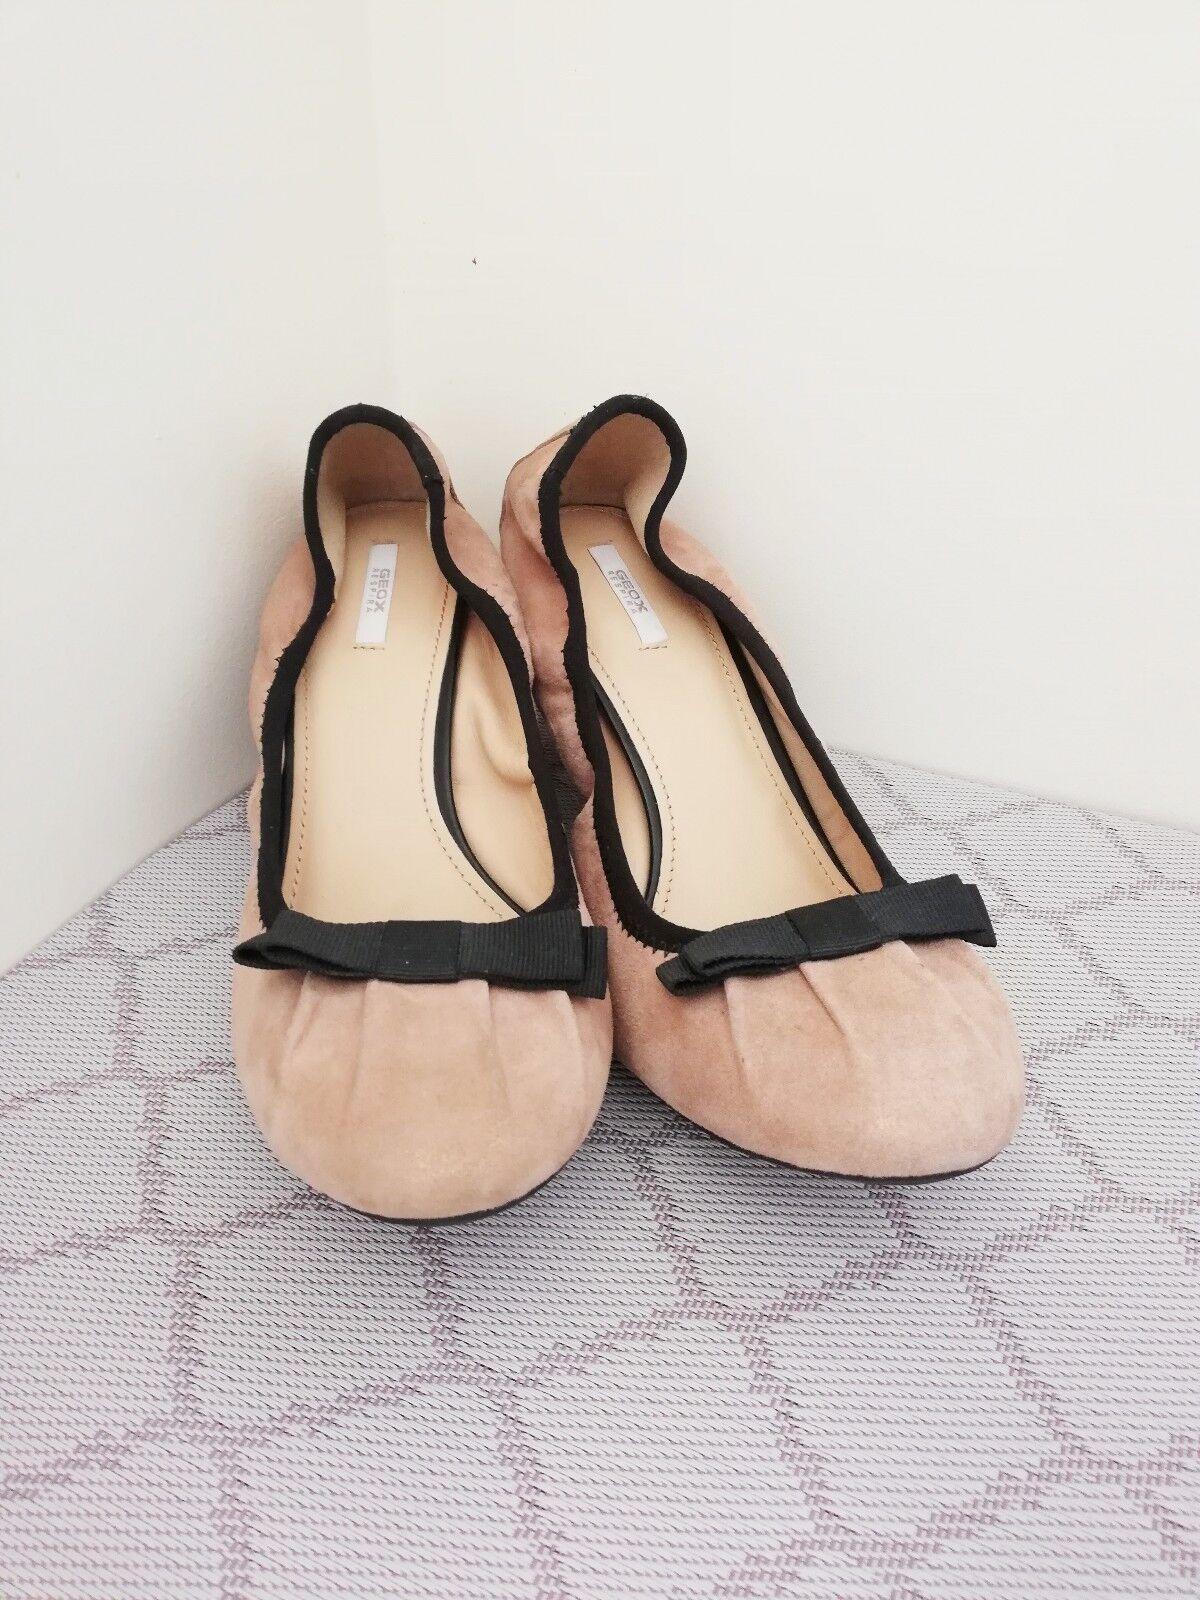 GEOX RESPIRA Nude Pink Court Leder Sparkle Bow Detail Court Pink Schuhes Sze EU39 UK6 US8.5 654792